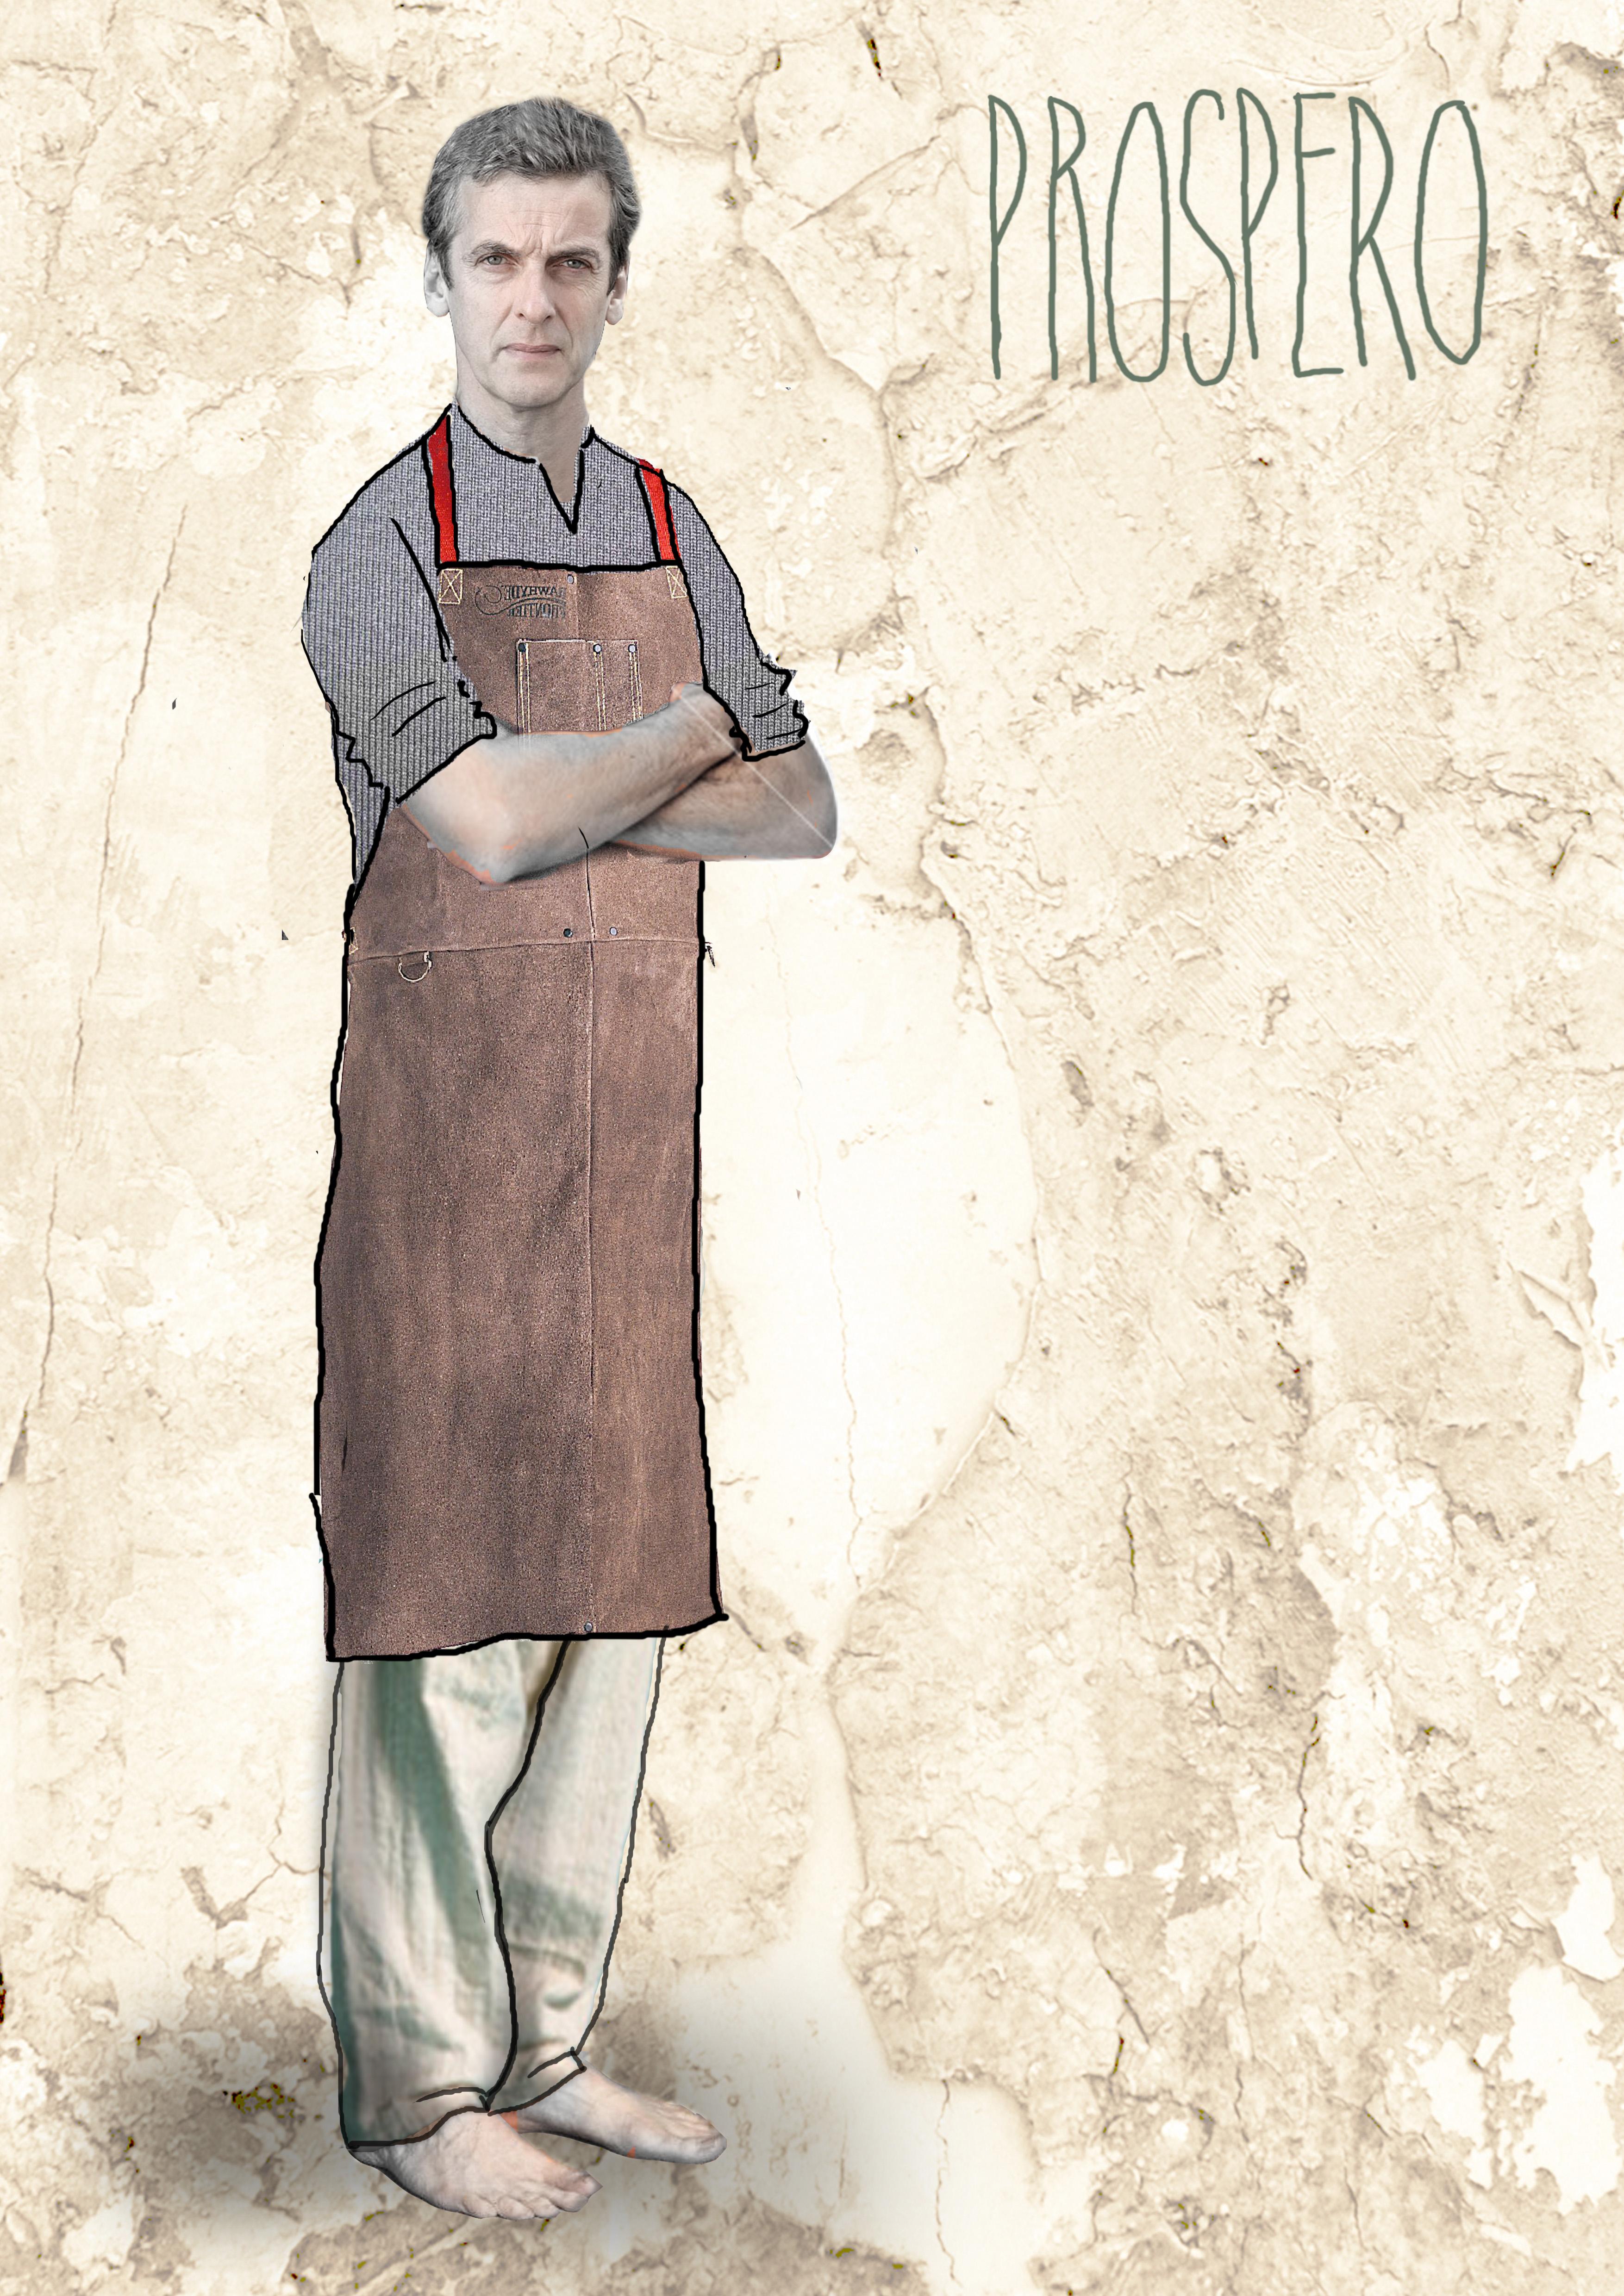 Prospero+workwear.jpg